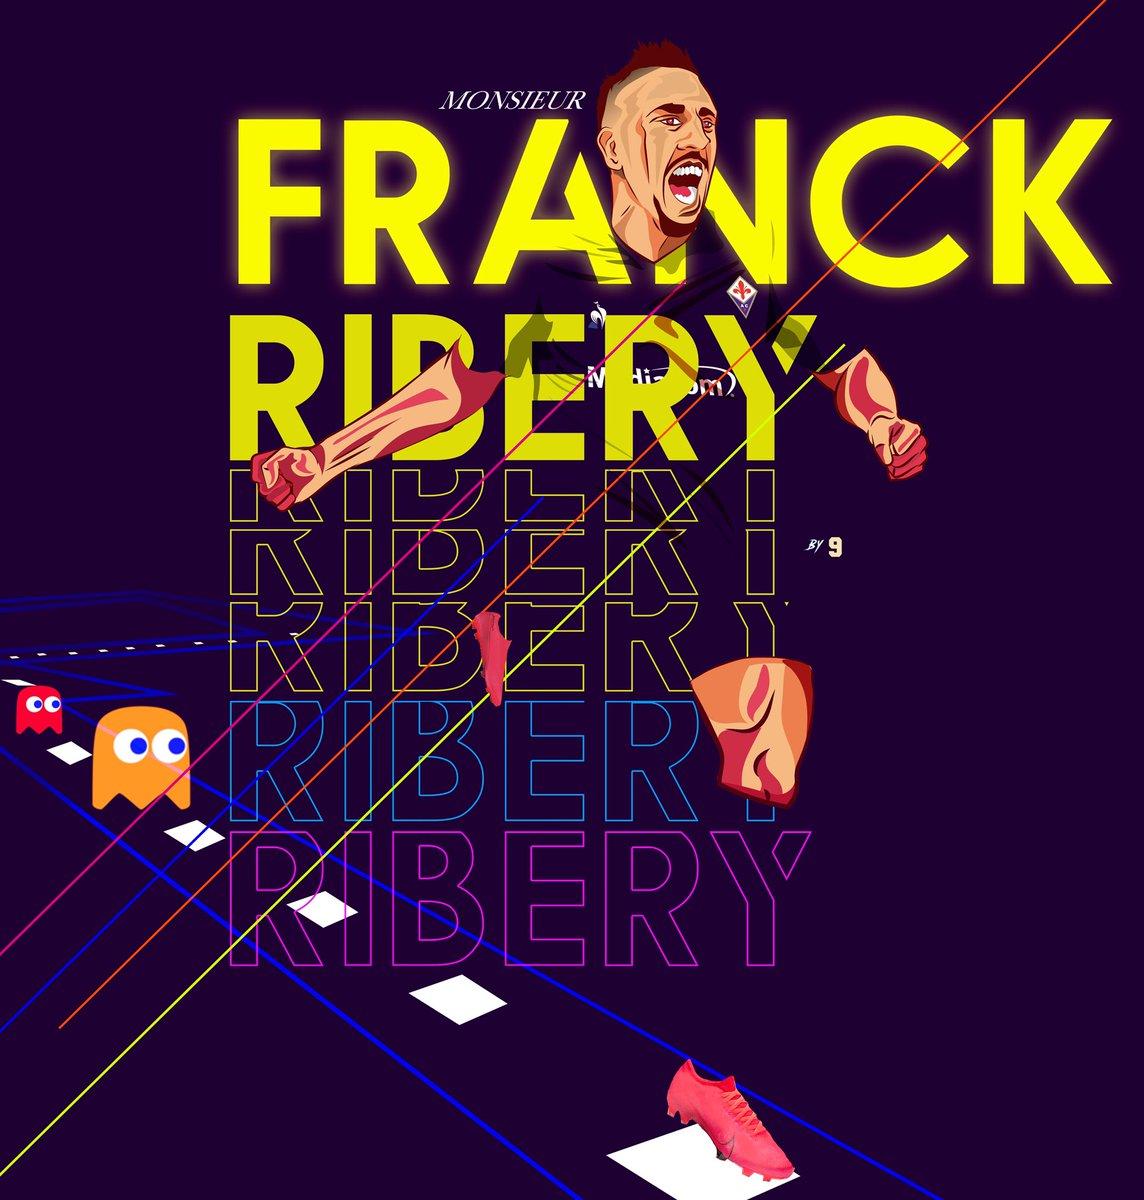 @ACFFiorentinaEN's photo on #PacManBirthday